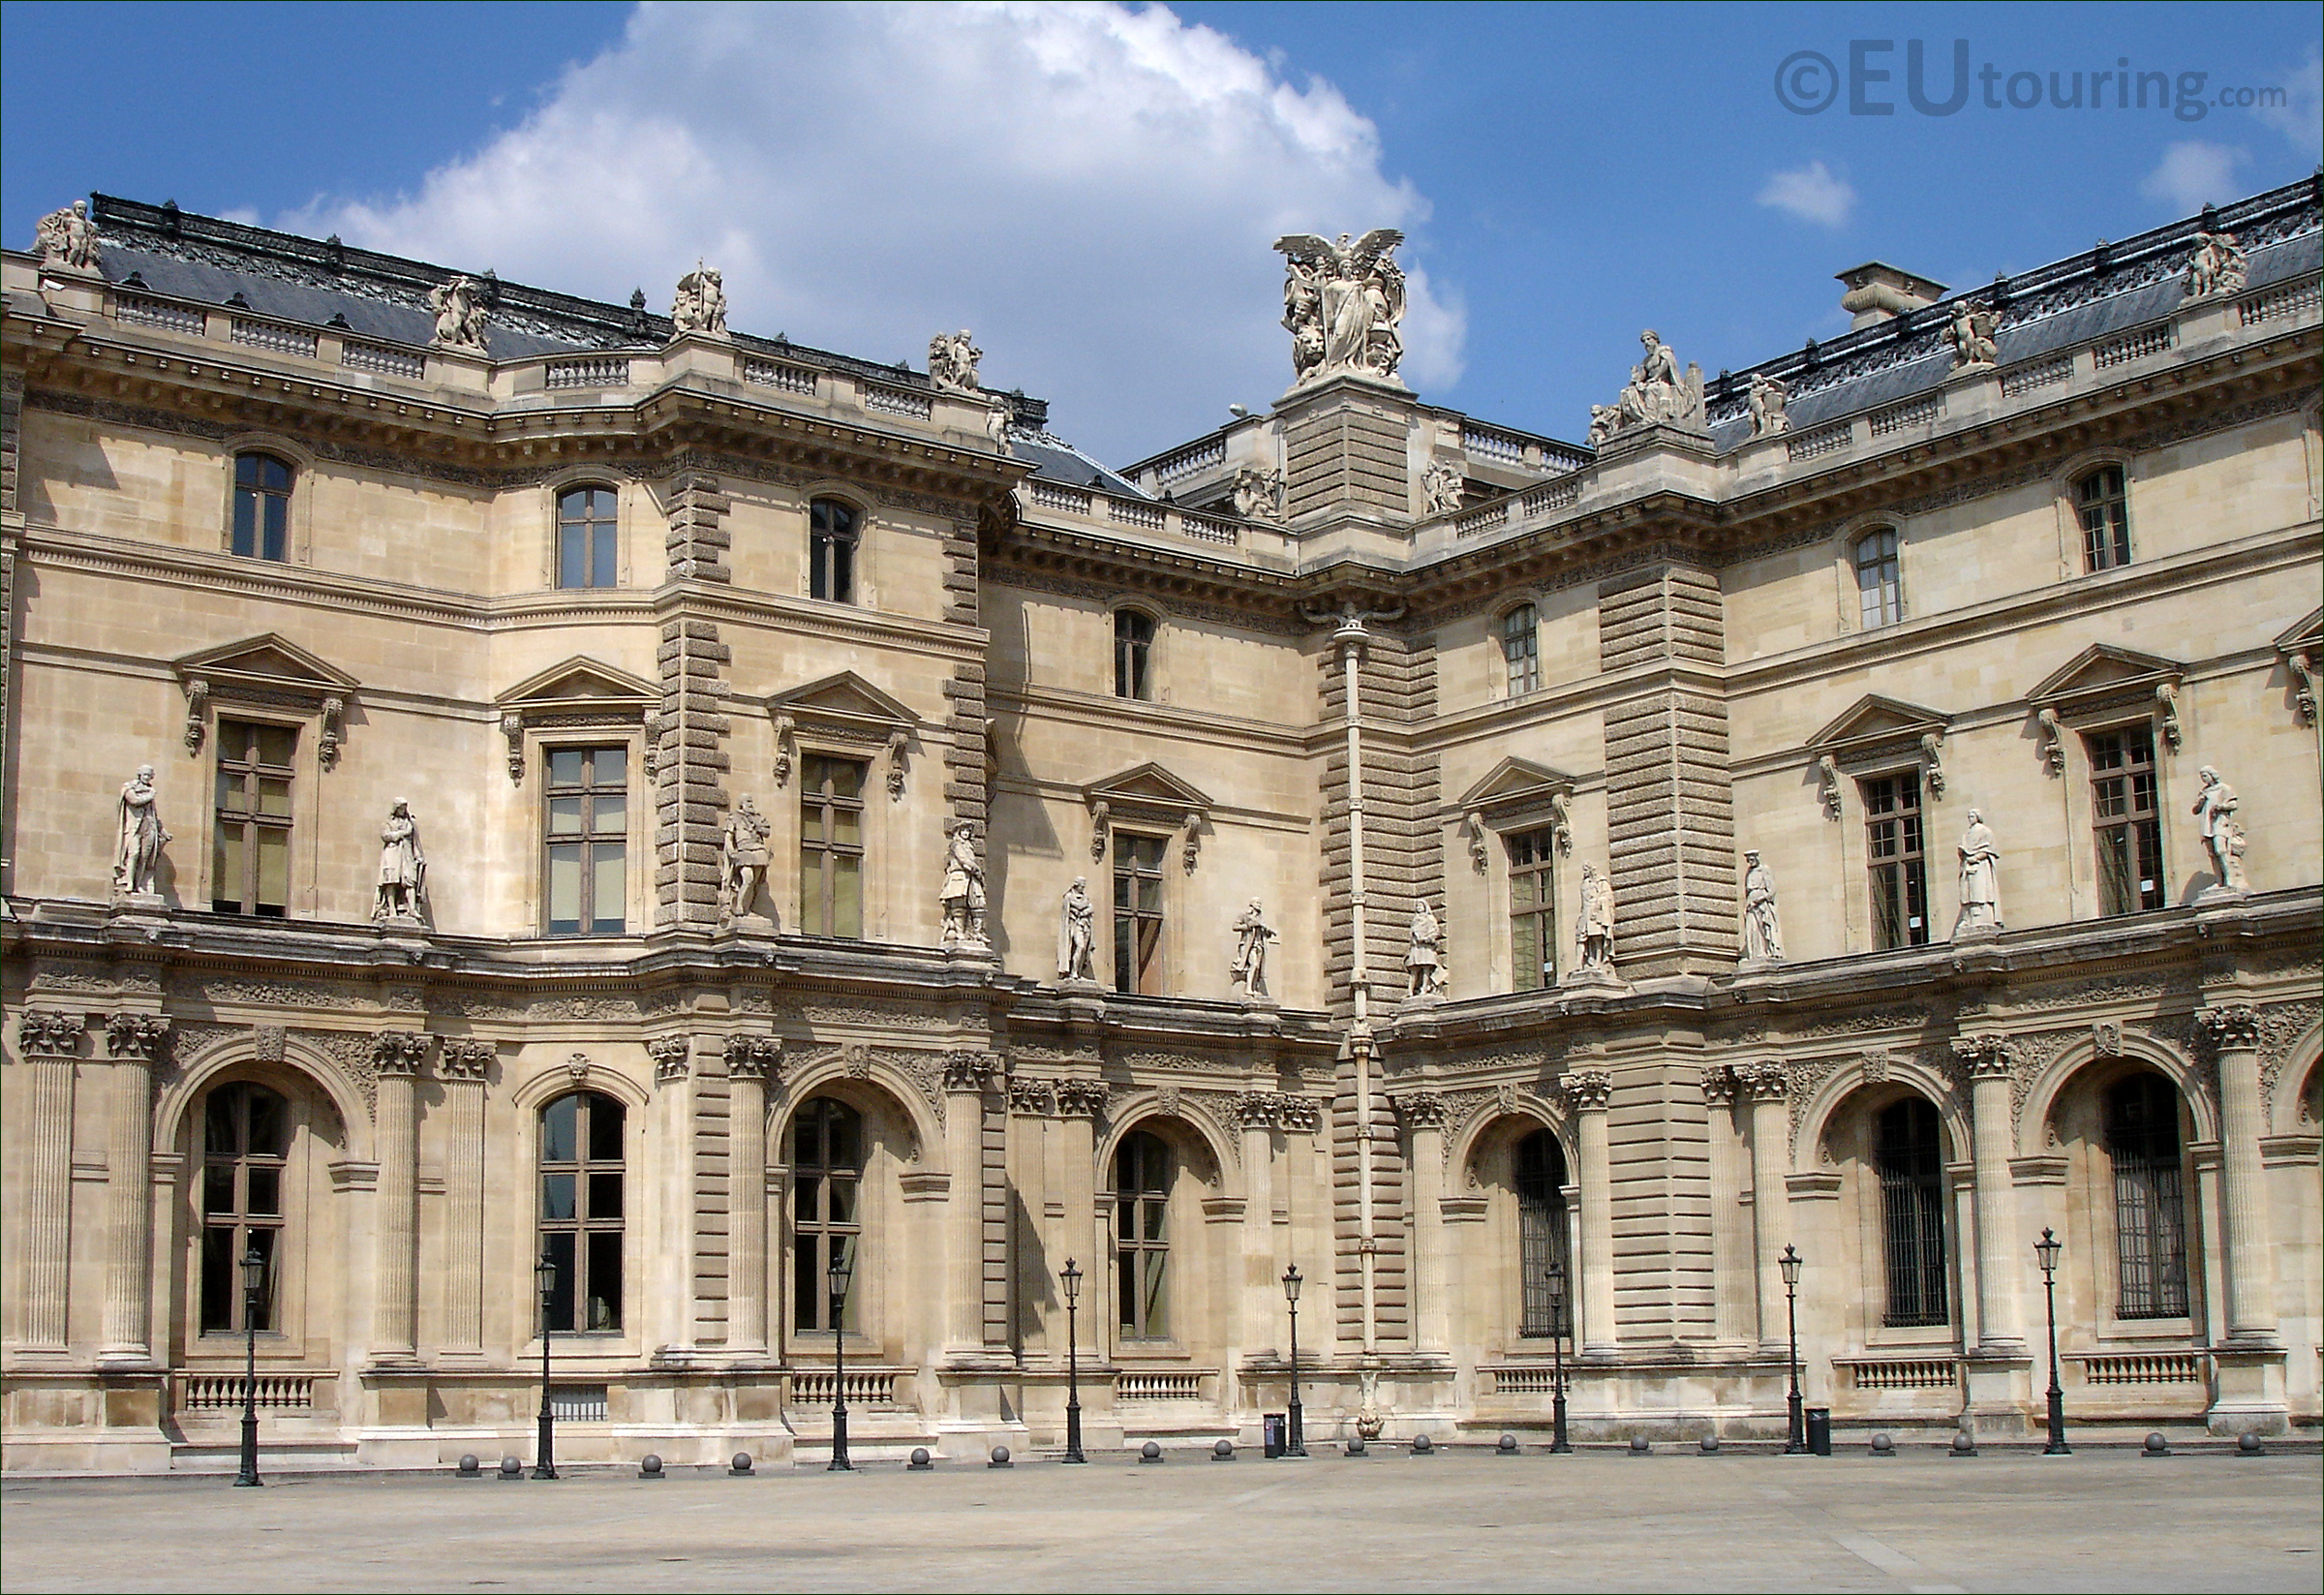 Corner of the Louvre Museum